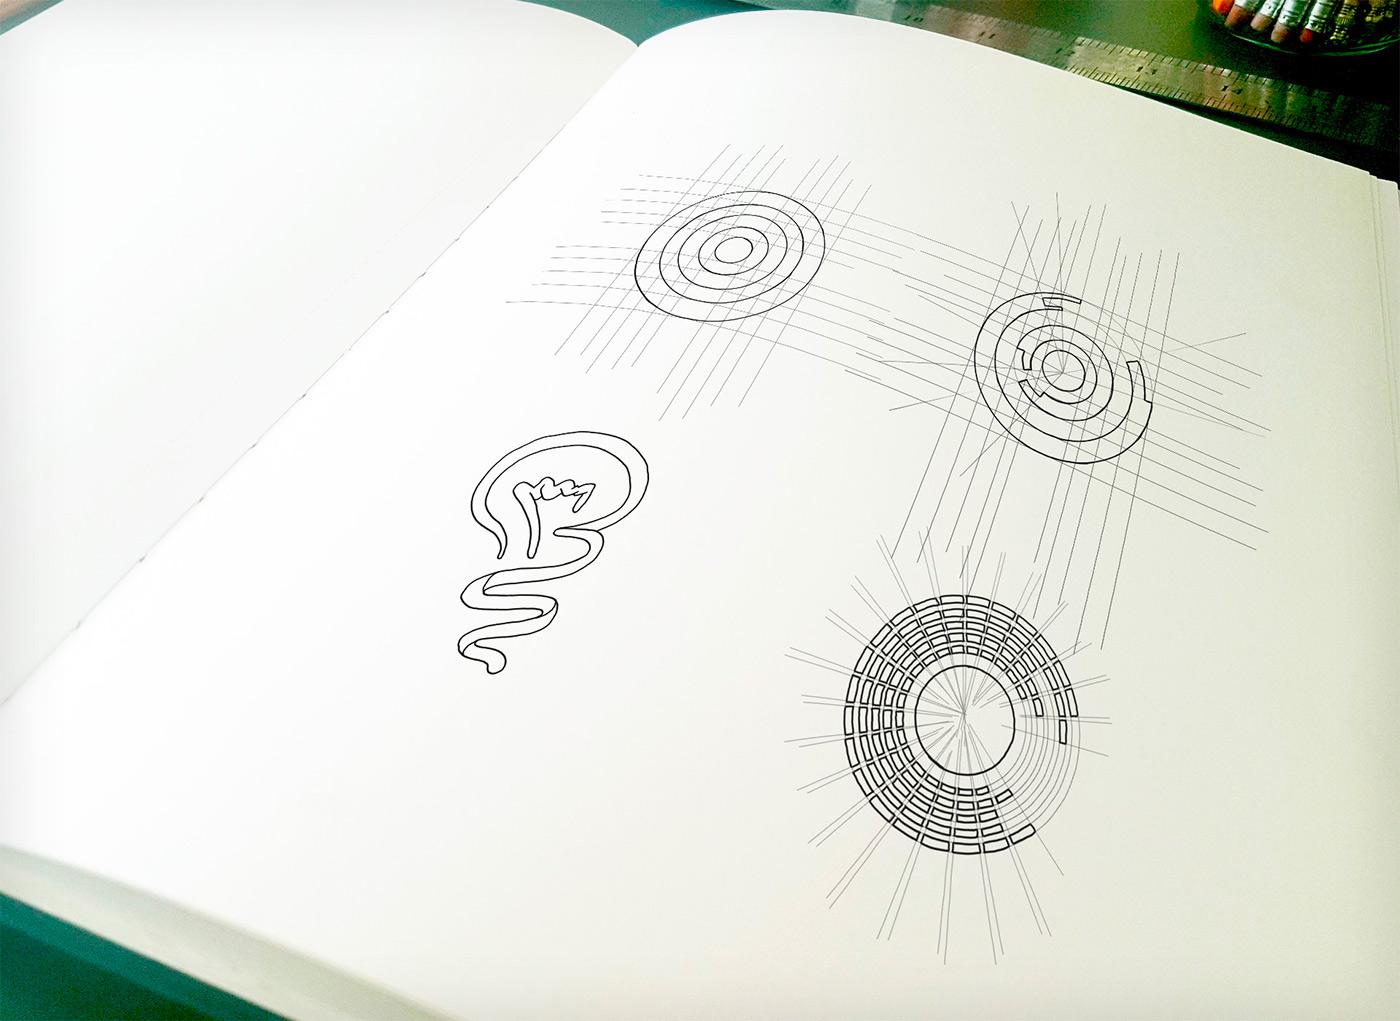 Startup logo sketches pencil סקיצות לוגו סטארטאפ עיפרון brightinfo